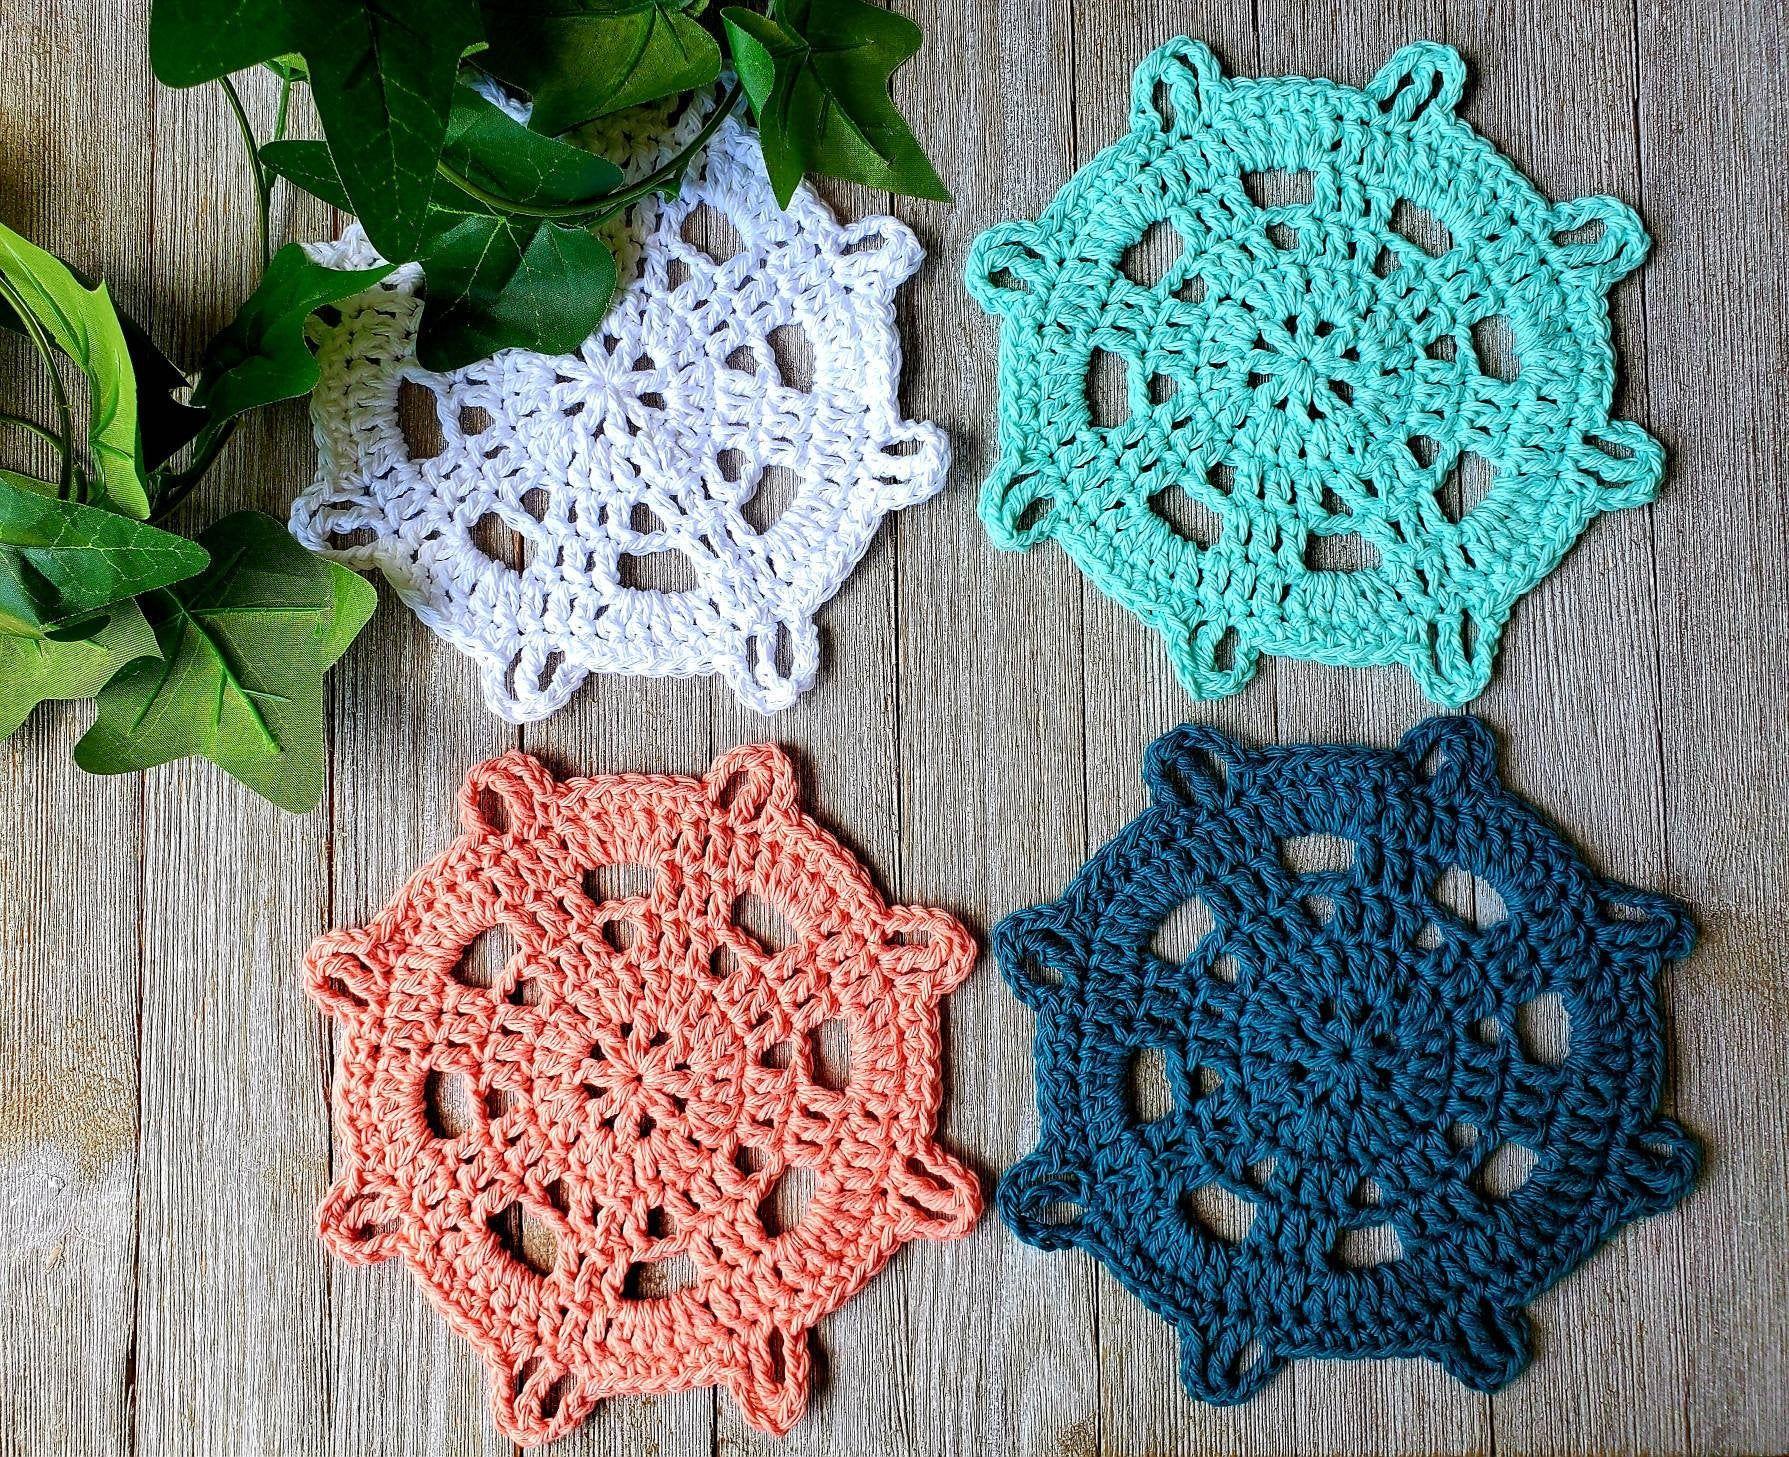 Beachy ship wheel coasters large crocheted cotton